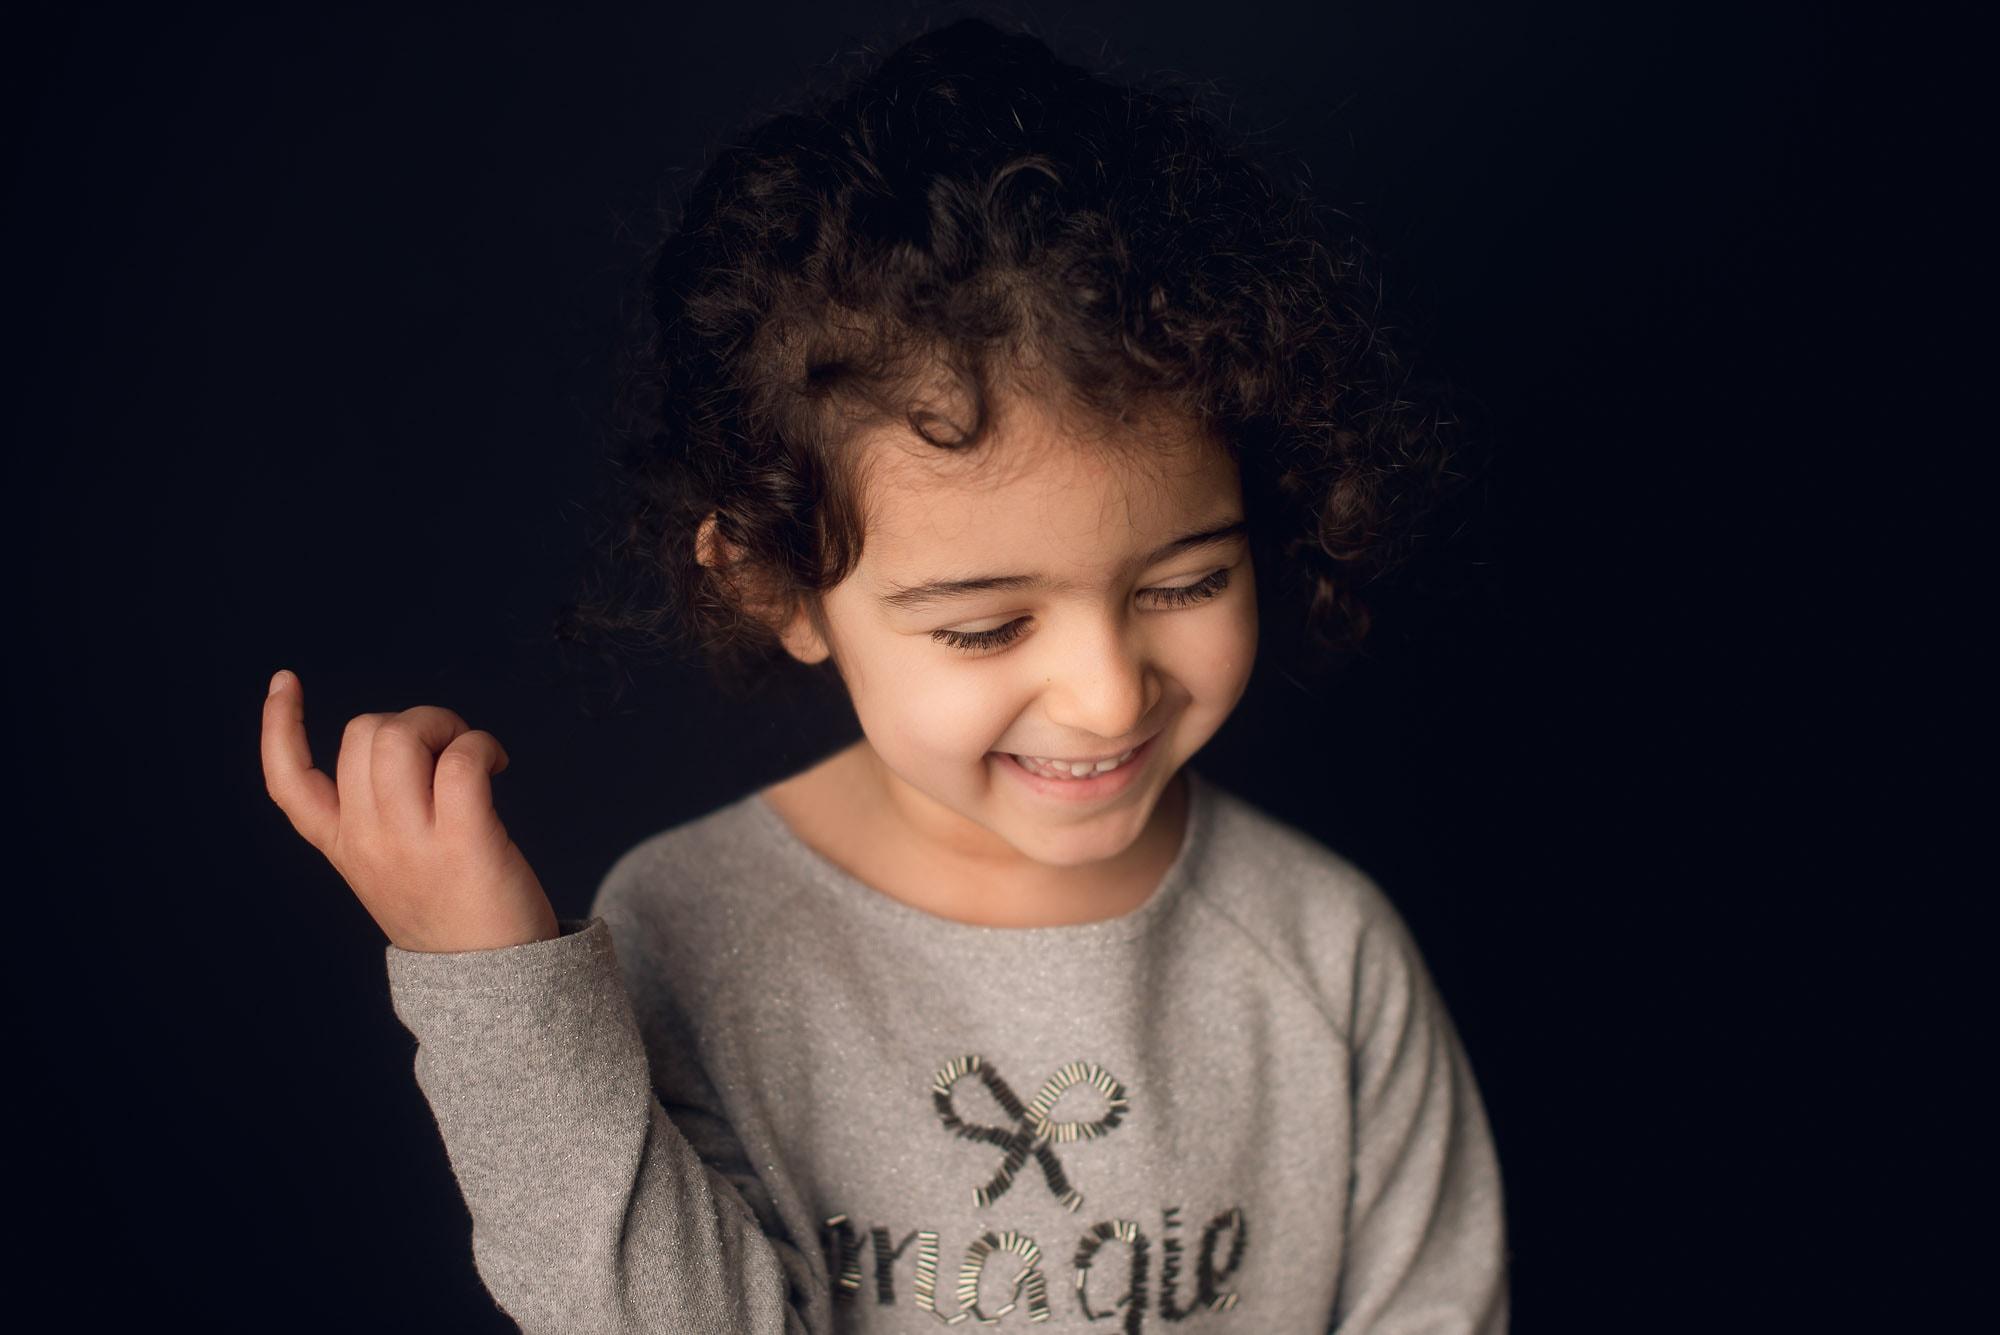 school photography on black background